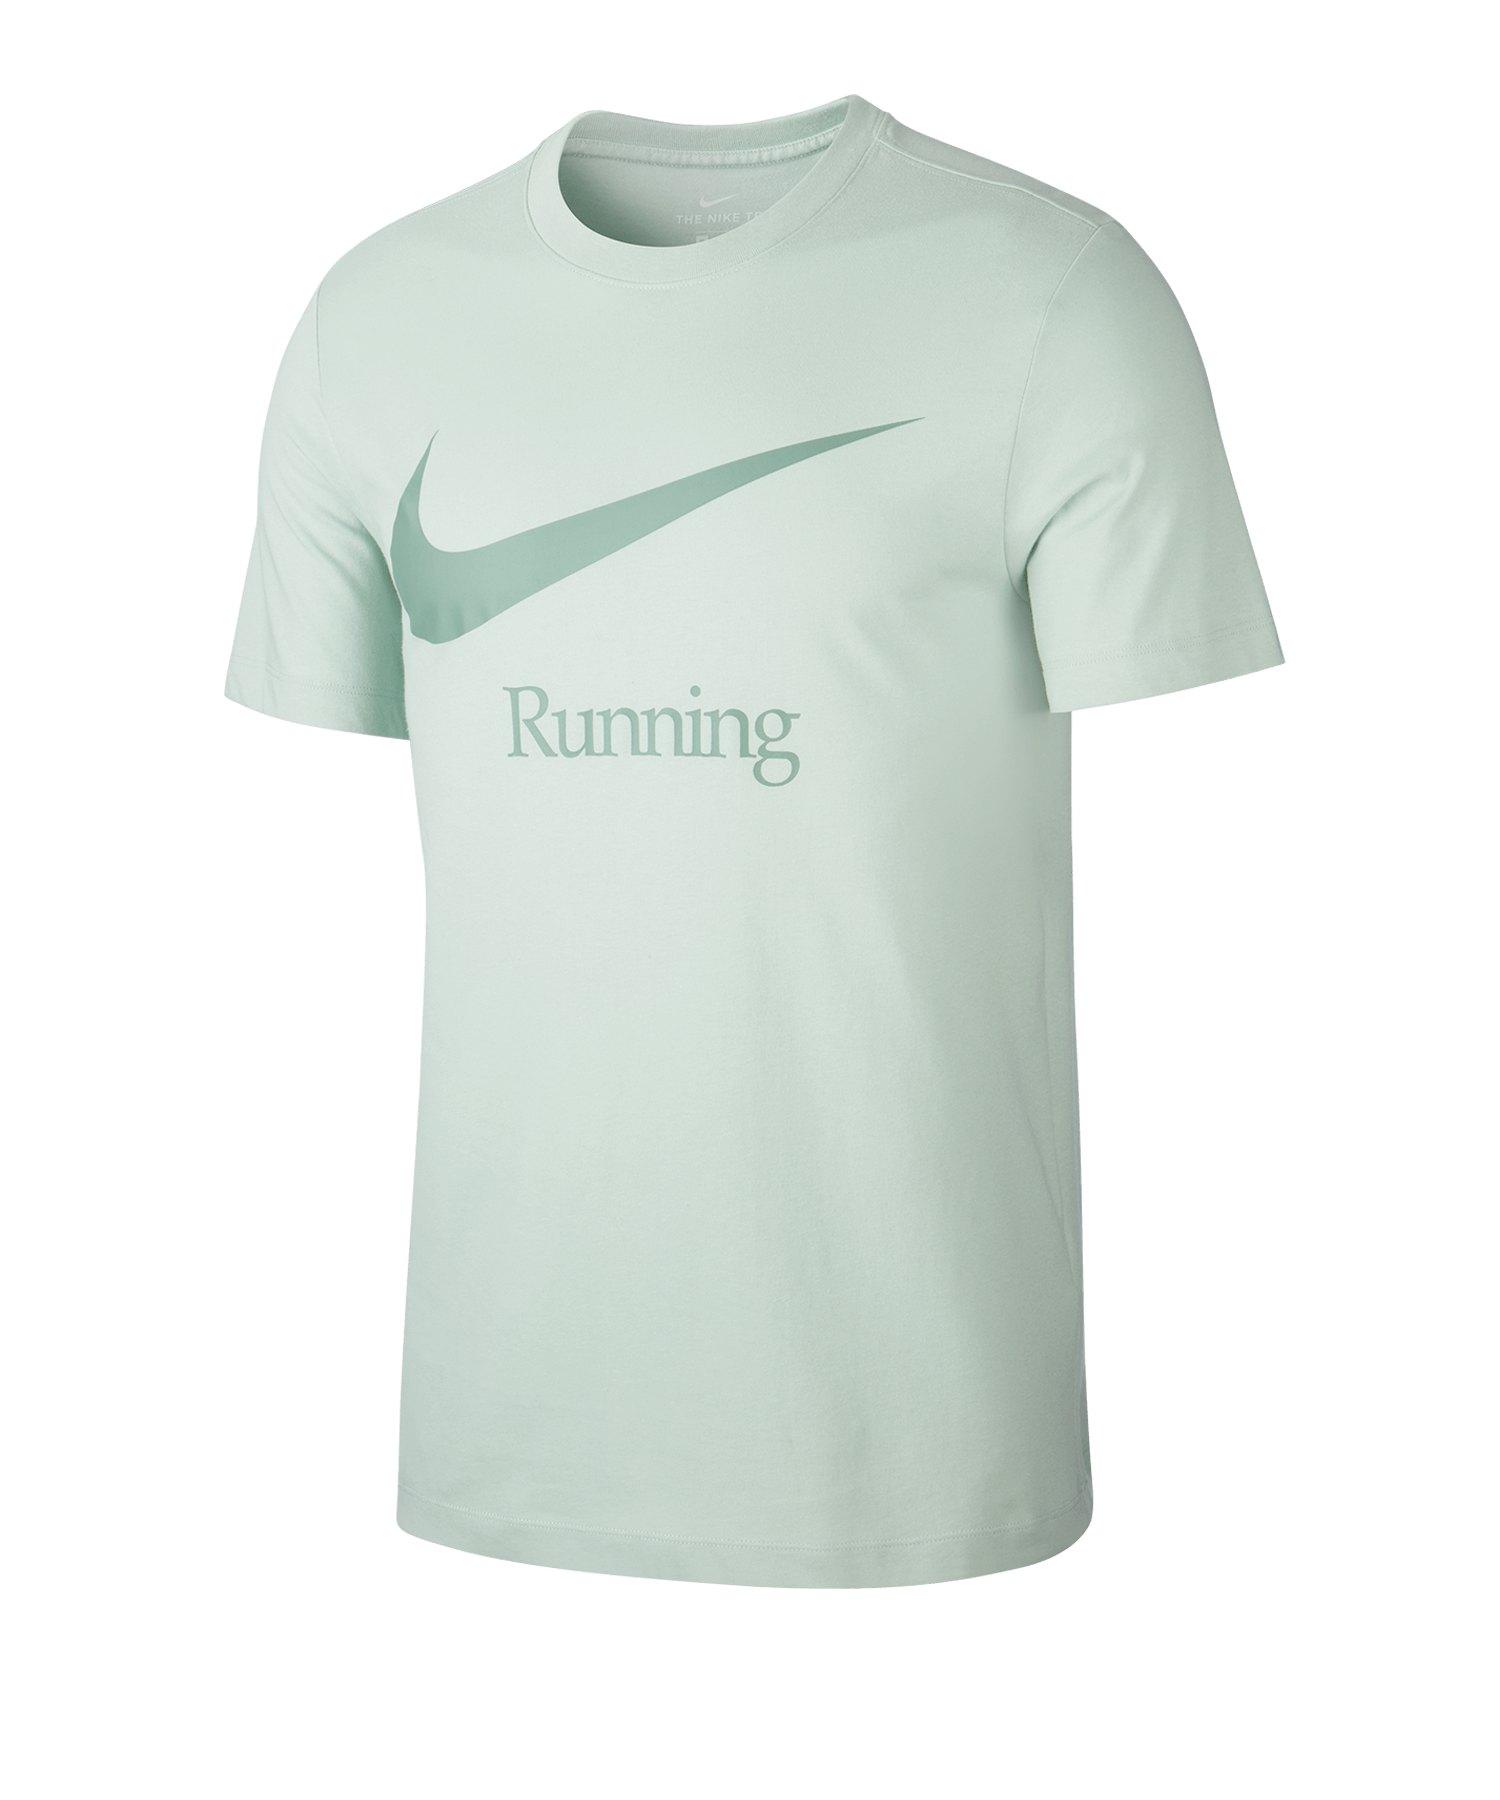 Nike Dri-FIT Tee T-Shirt Running Blau F321 - blau